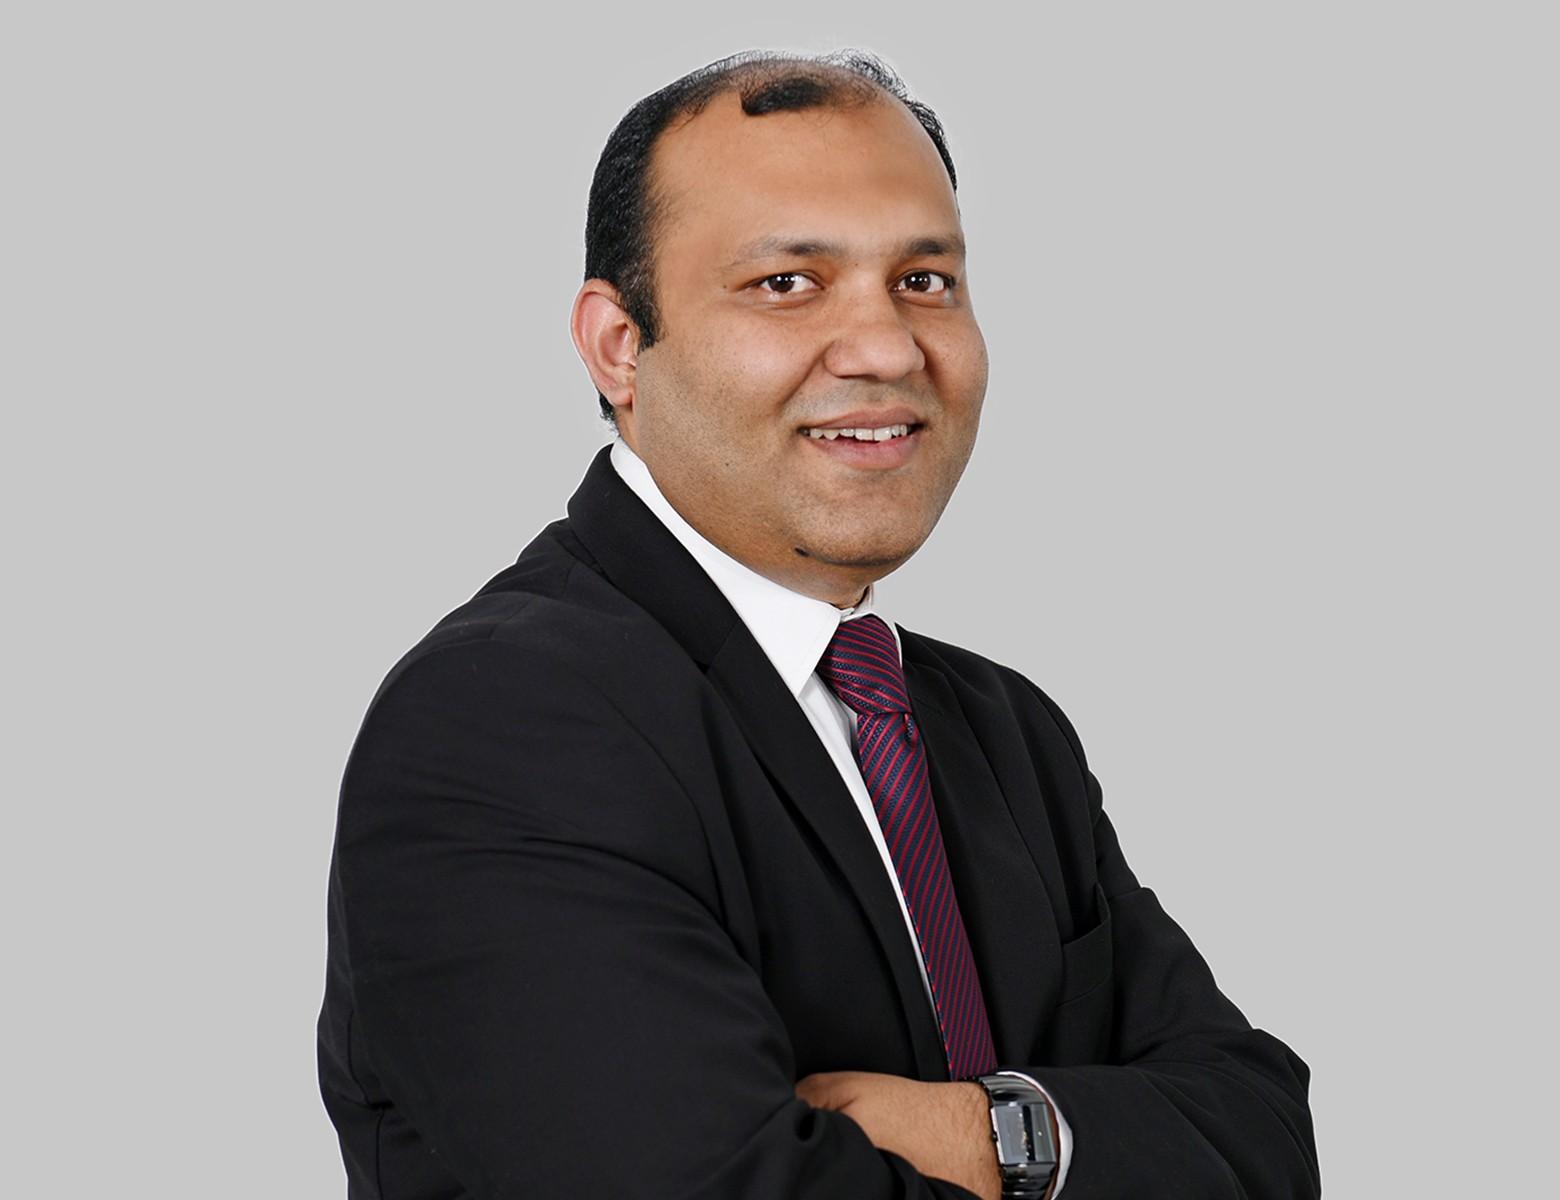 Shahzad Anwar